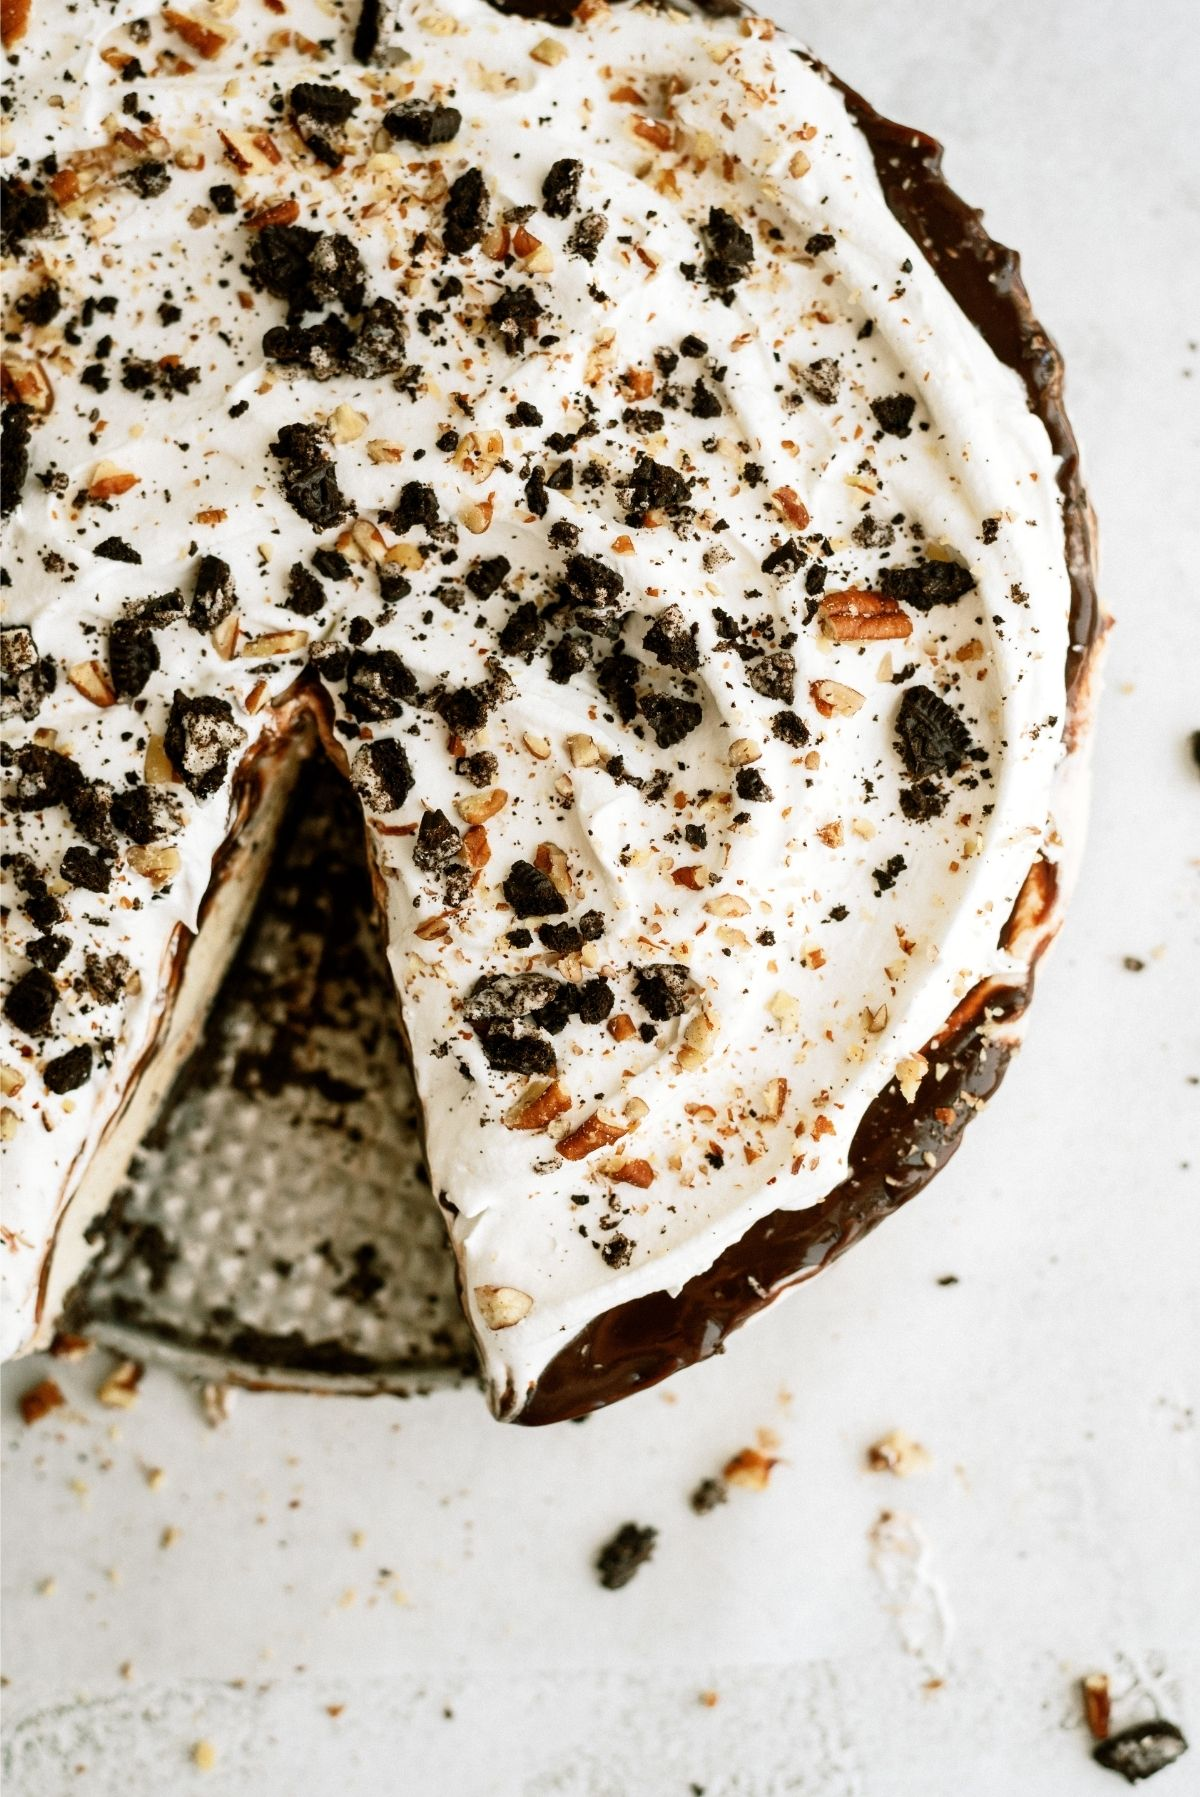 No Bake Mississippi Mud Ice Cream Pie with one slice misssing